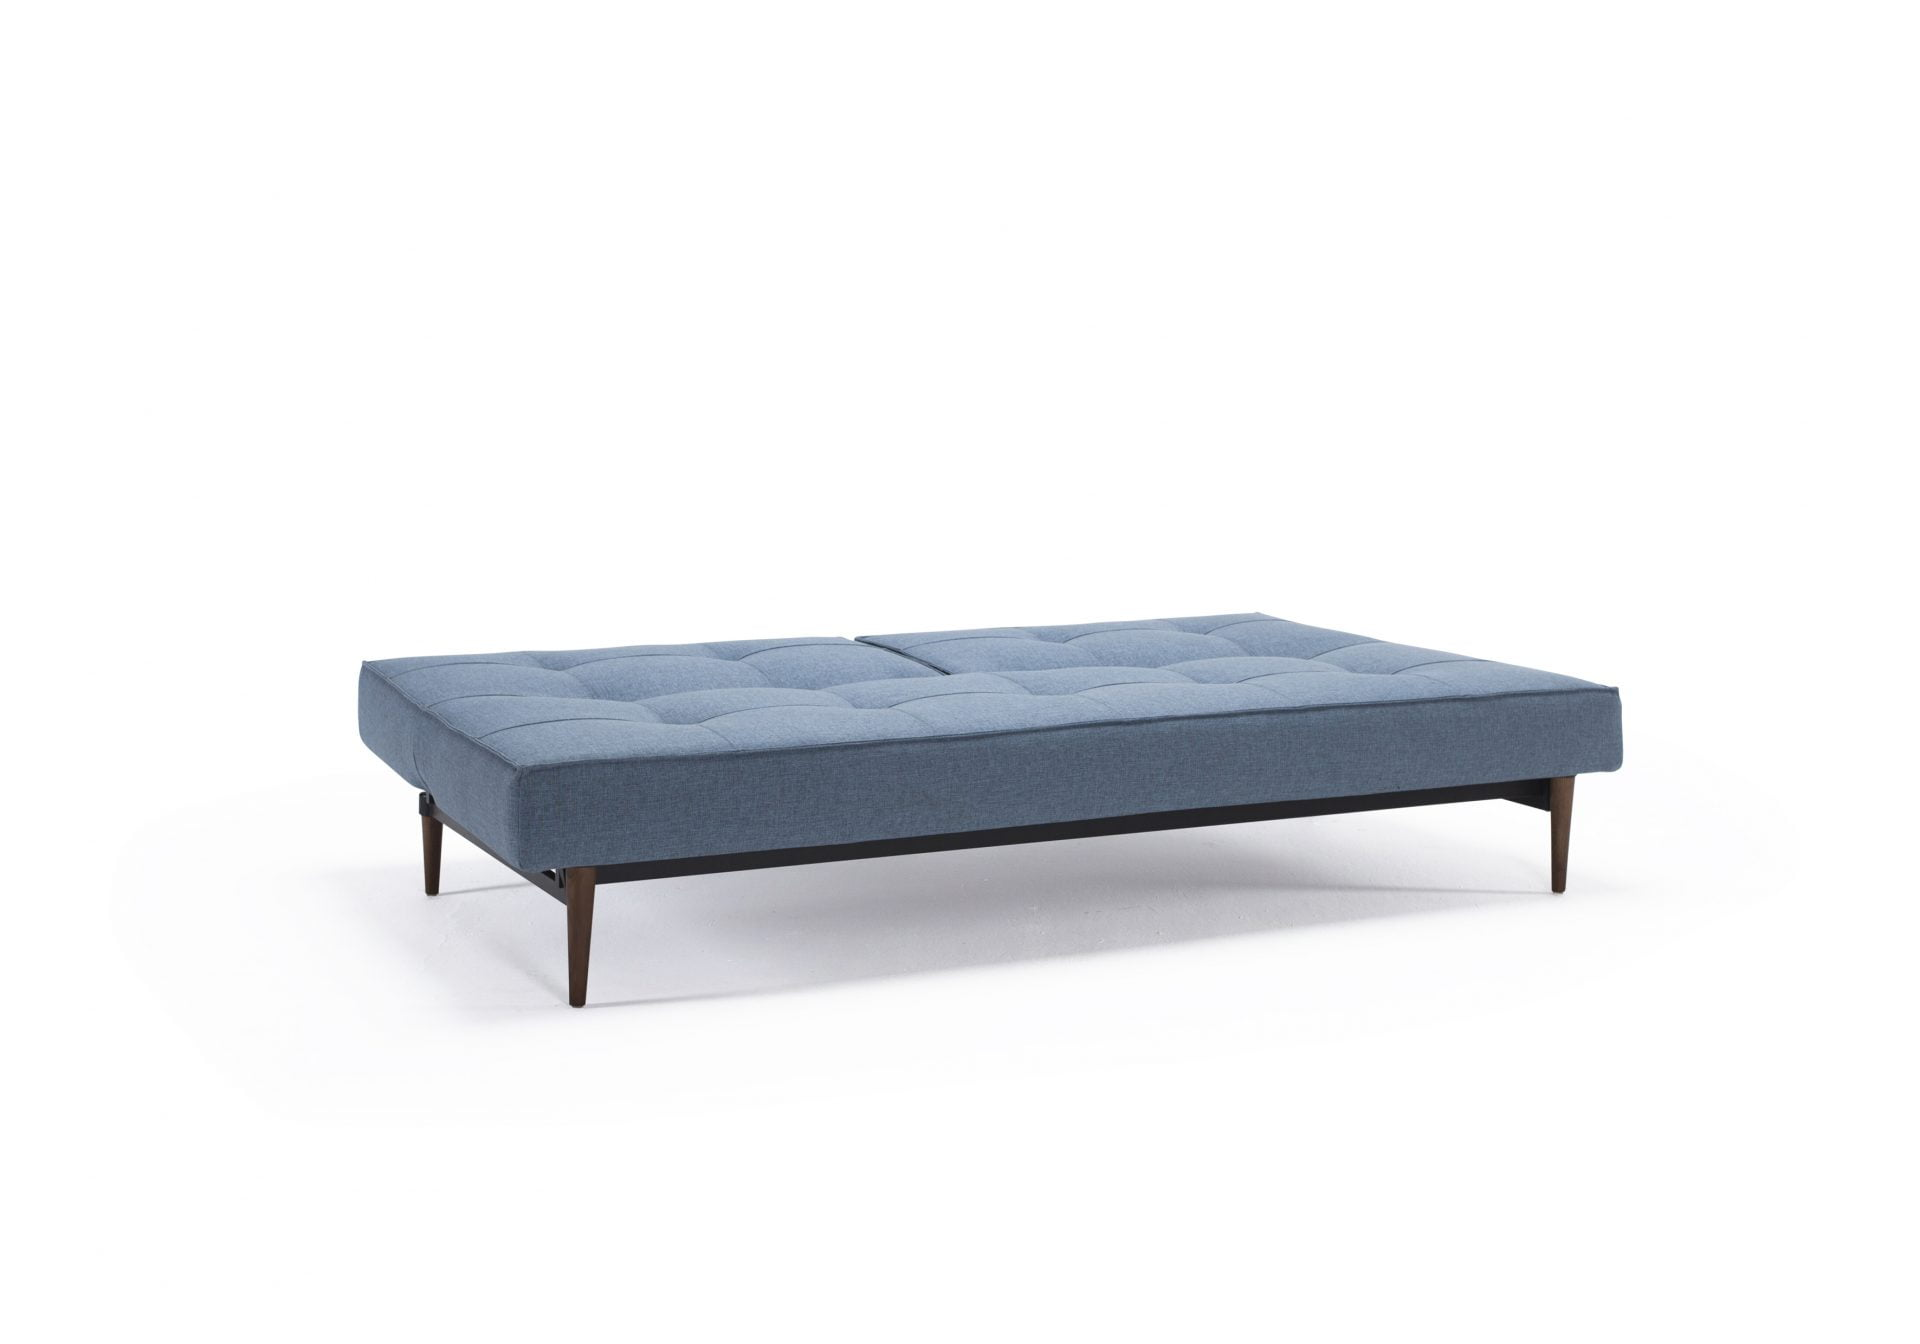 innovation splitback styletto sovesofa. Black Bedroom Furniture Sets. Home Design Ideas